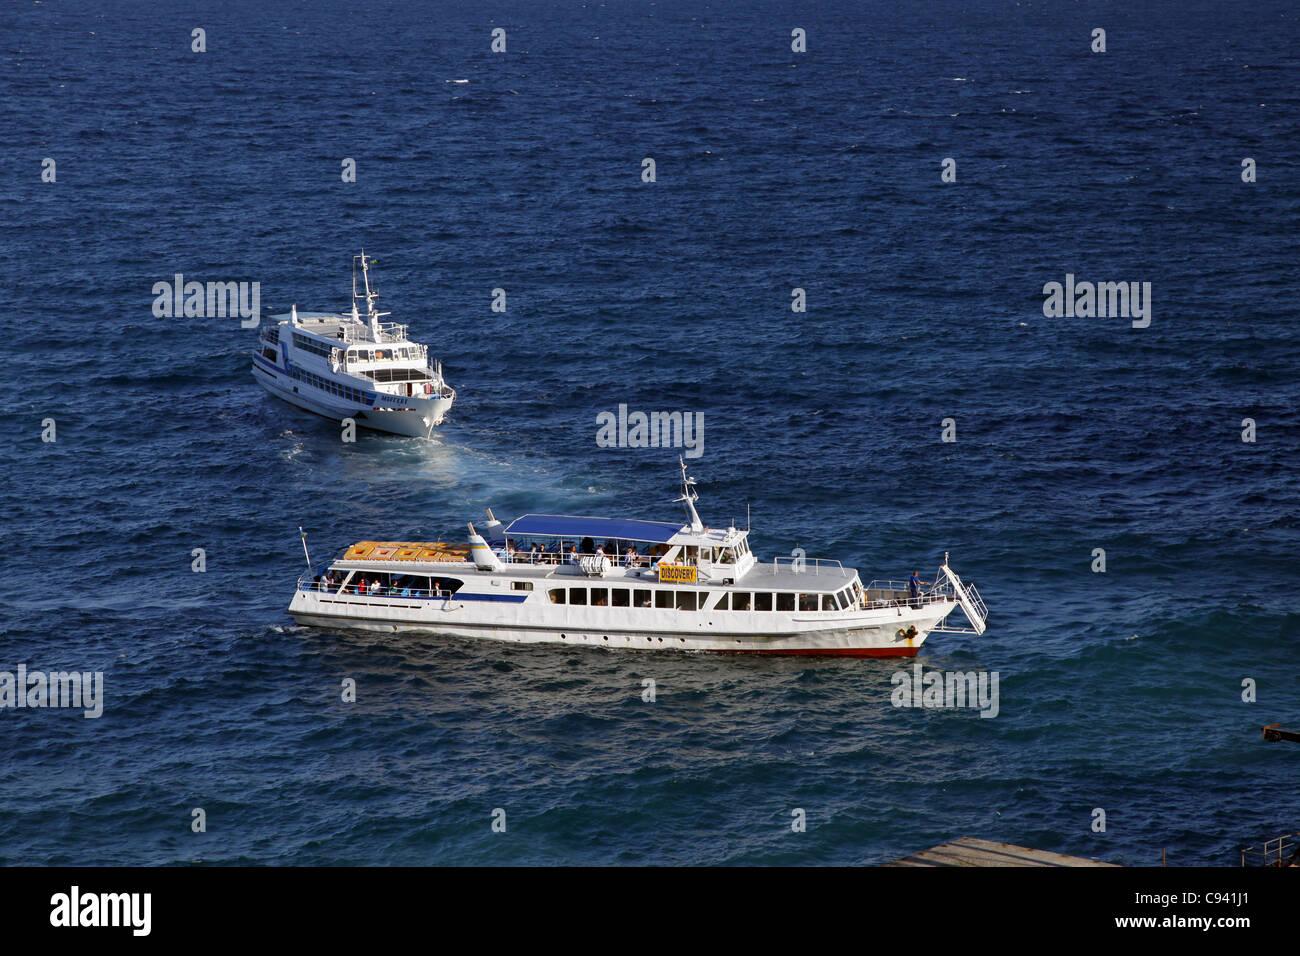 TOURIST SHIP & BOAT CAPE AI-TODOR CRIMEA UKRAINE 27 September 2011 - Stock Image